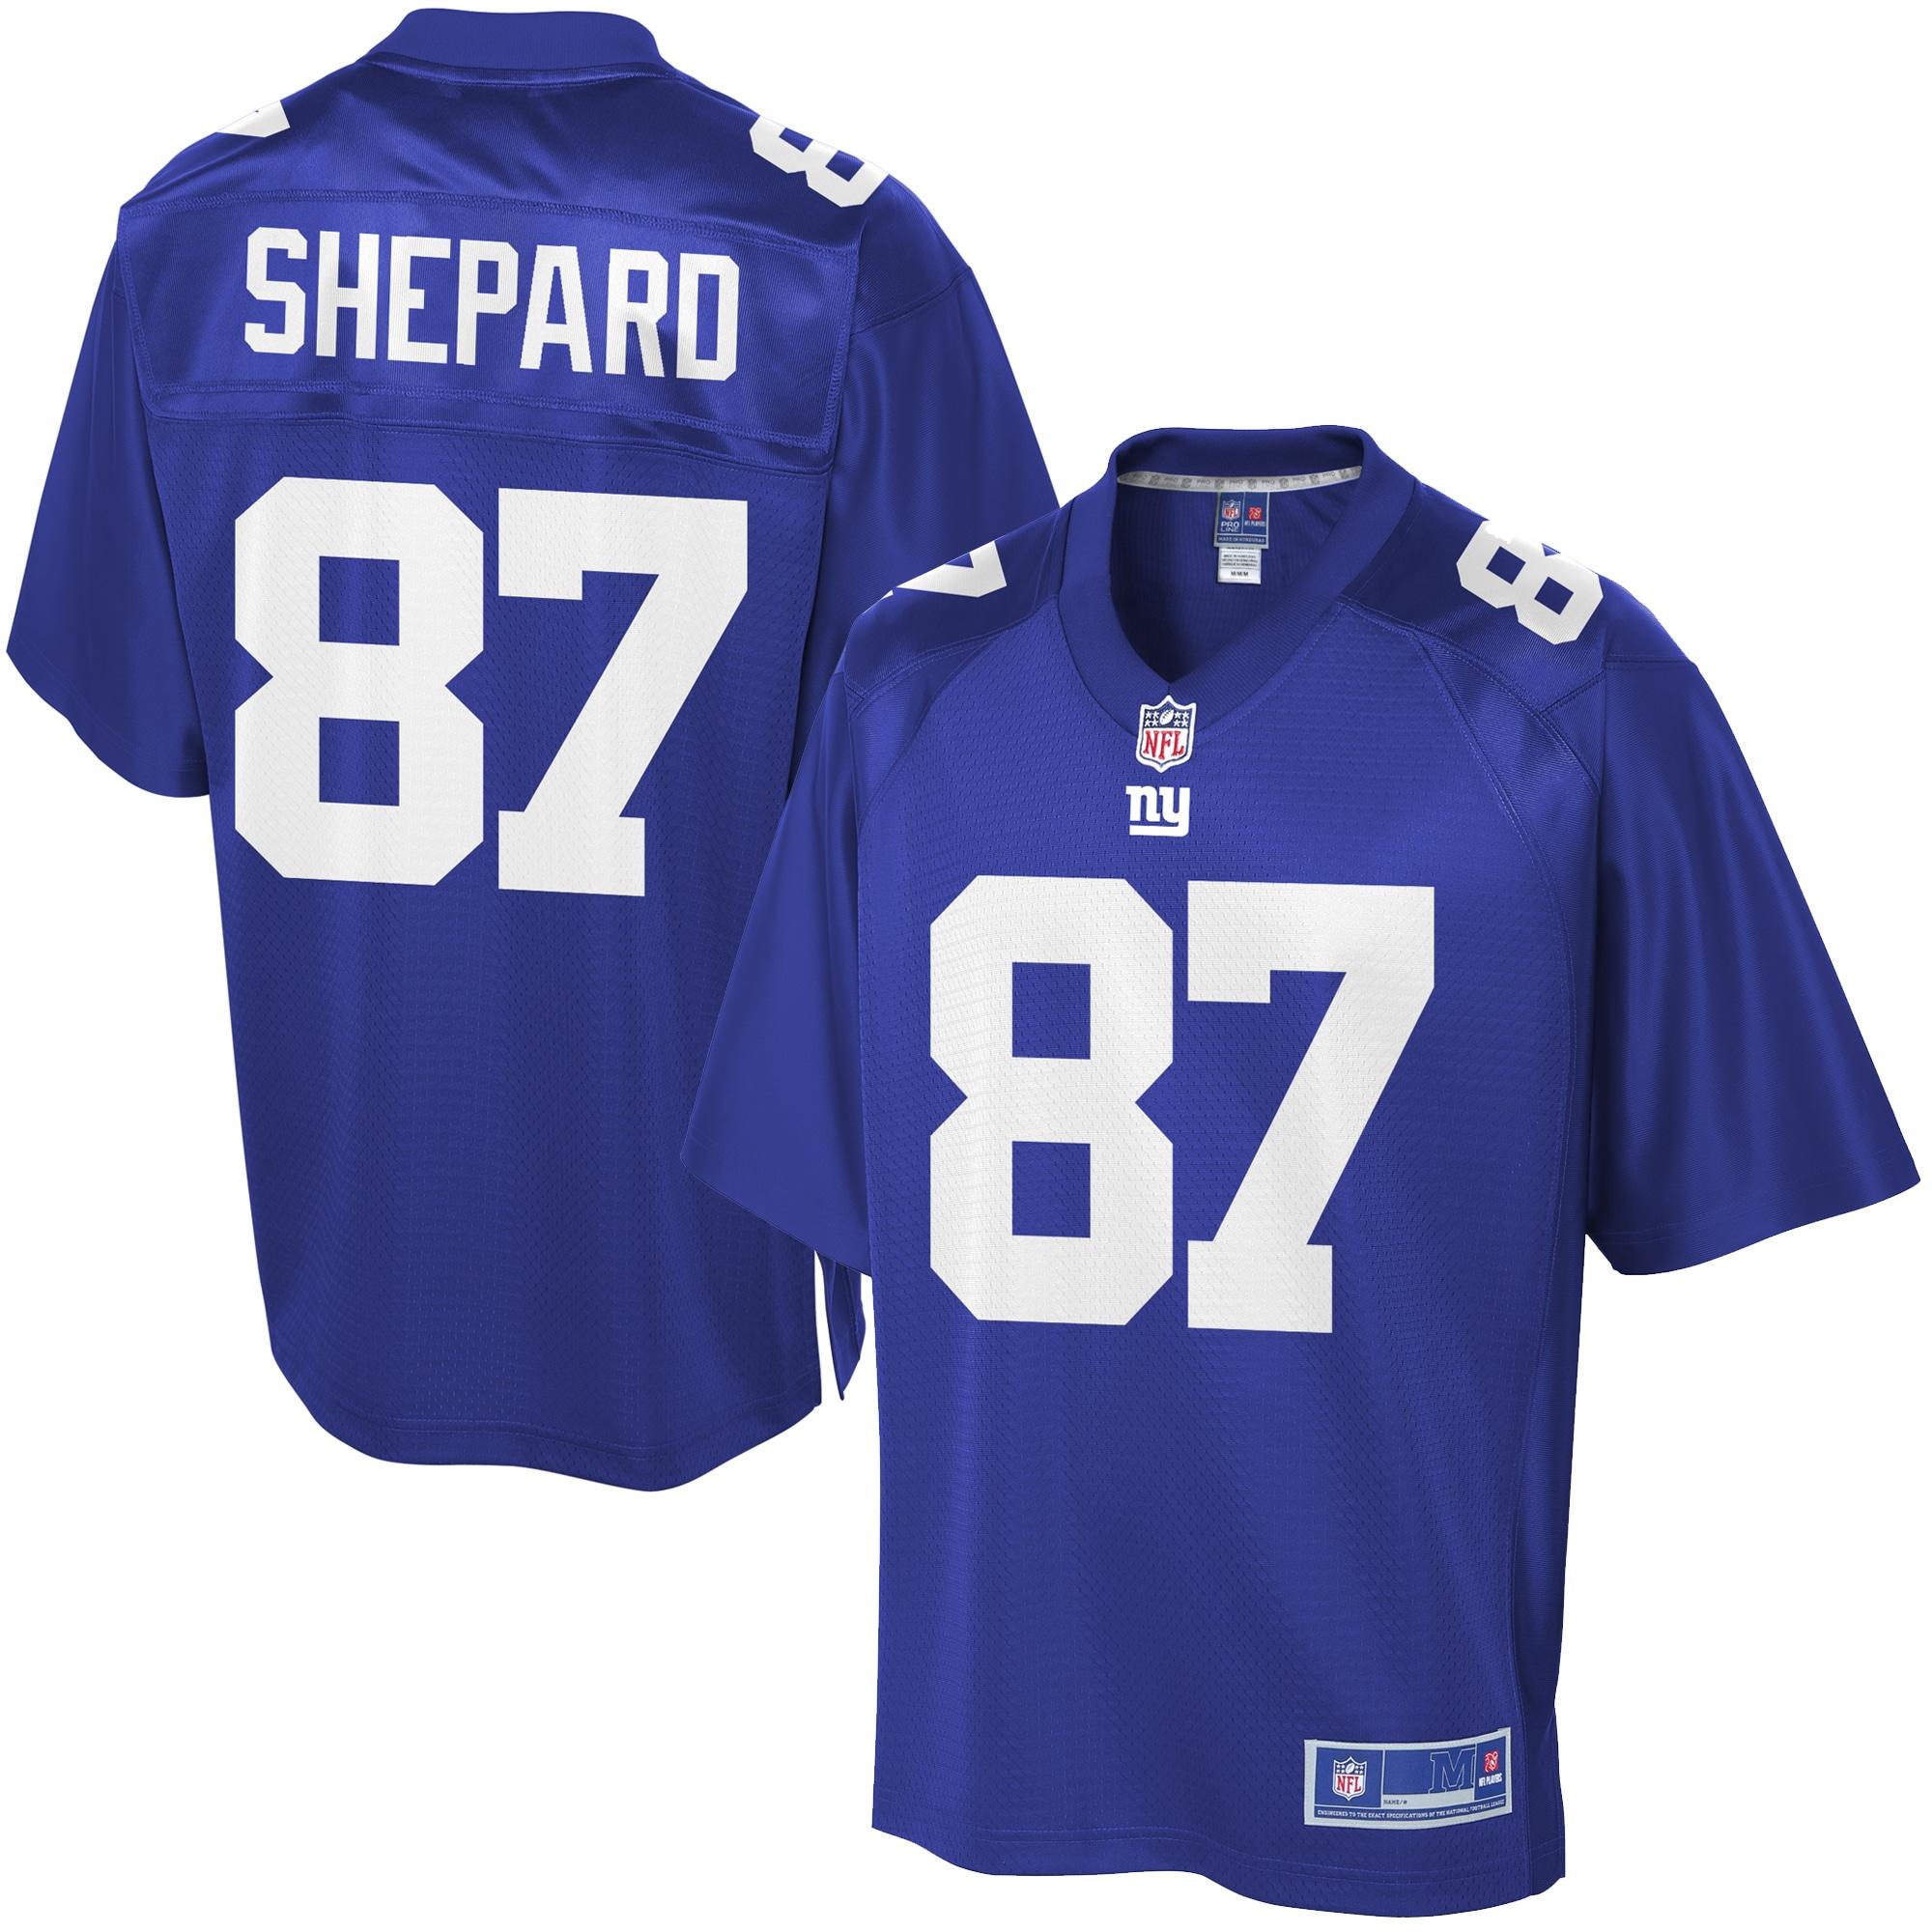 Sterling Shepard New York Giants Pro Line Player Jersey - Royal